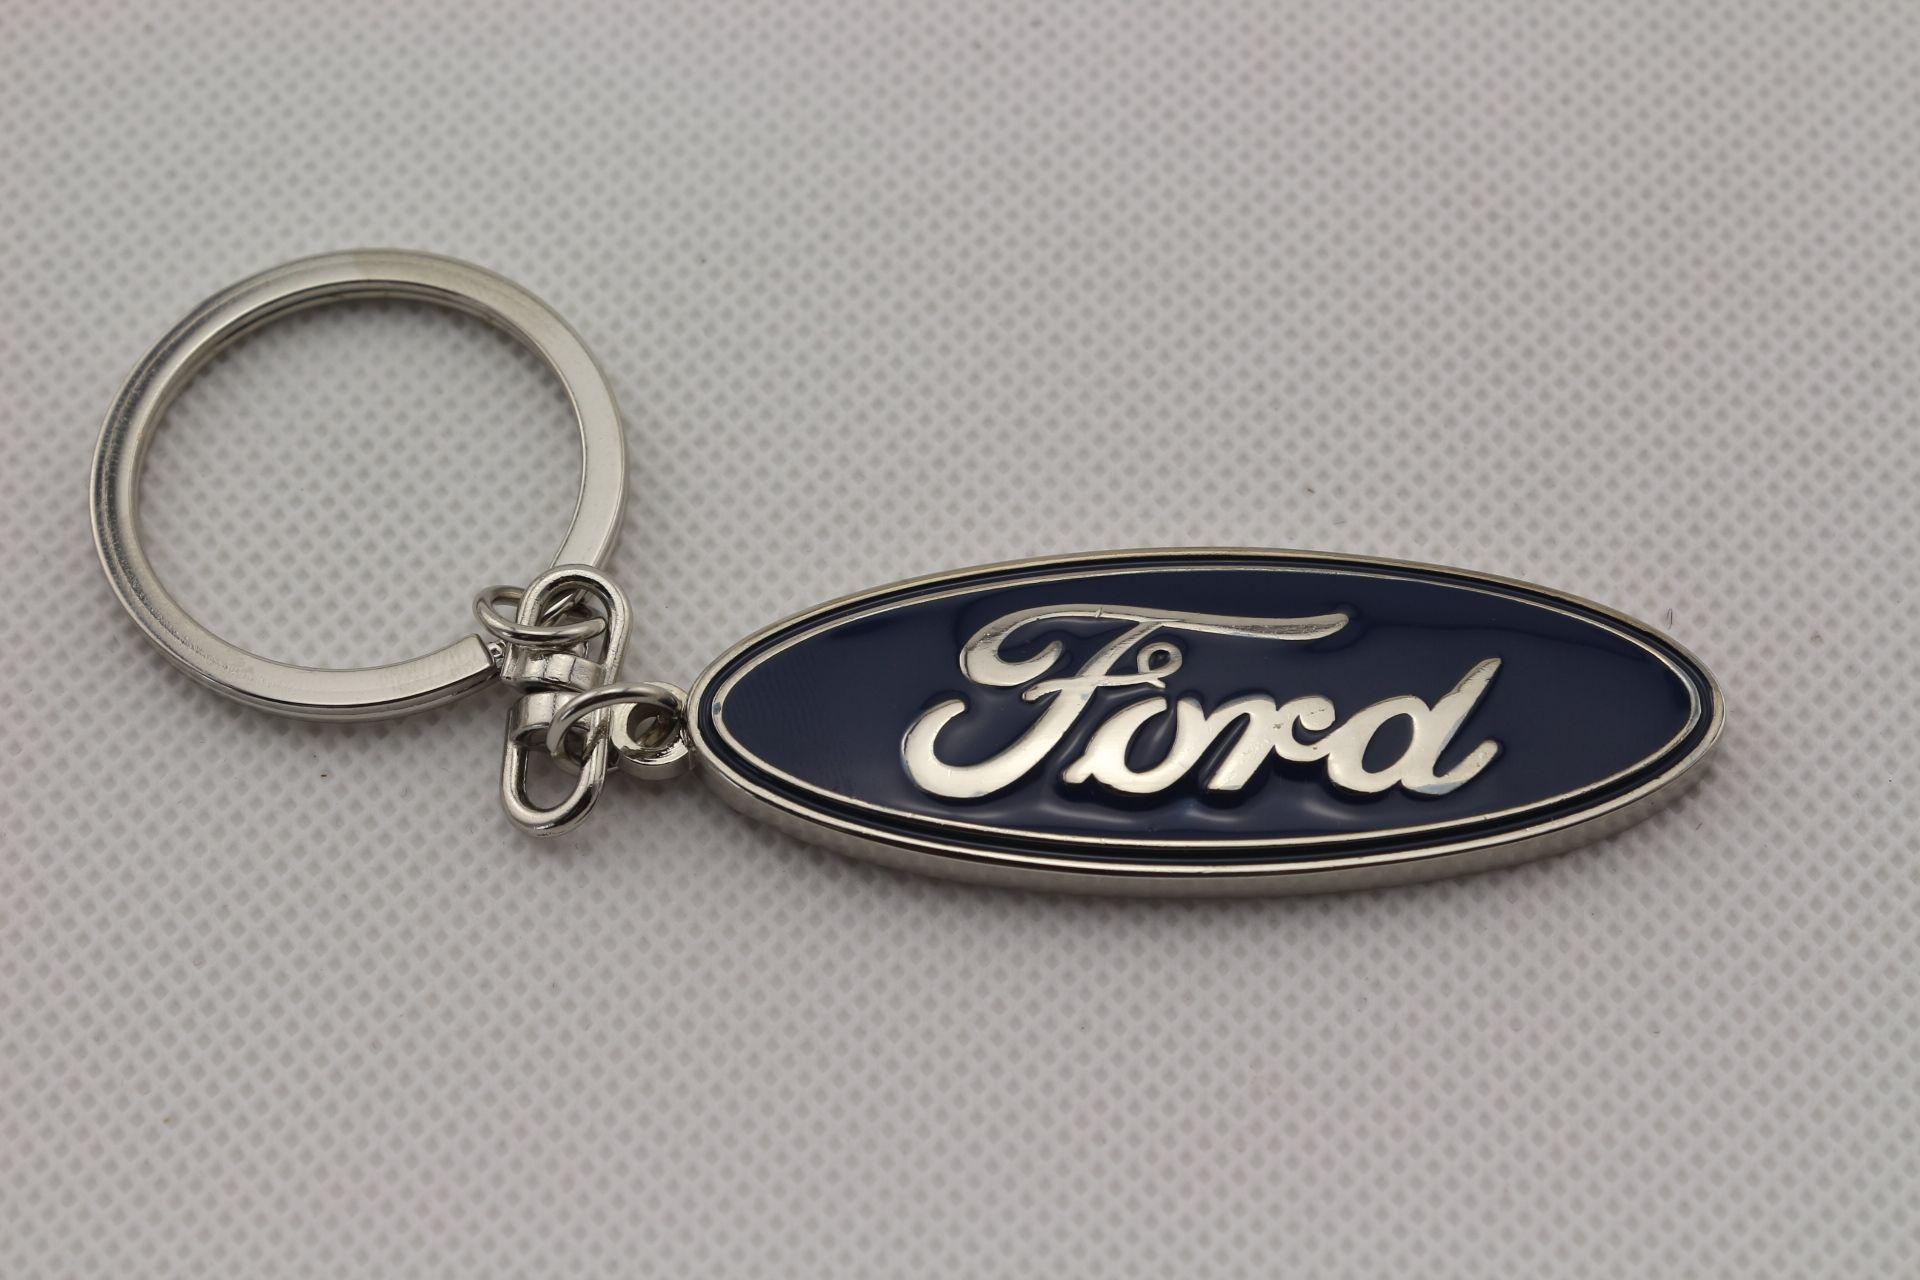 3D Car Logo Key Fob Keychain Keyring Key Chain Key Ring KeyHolder